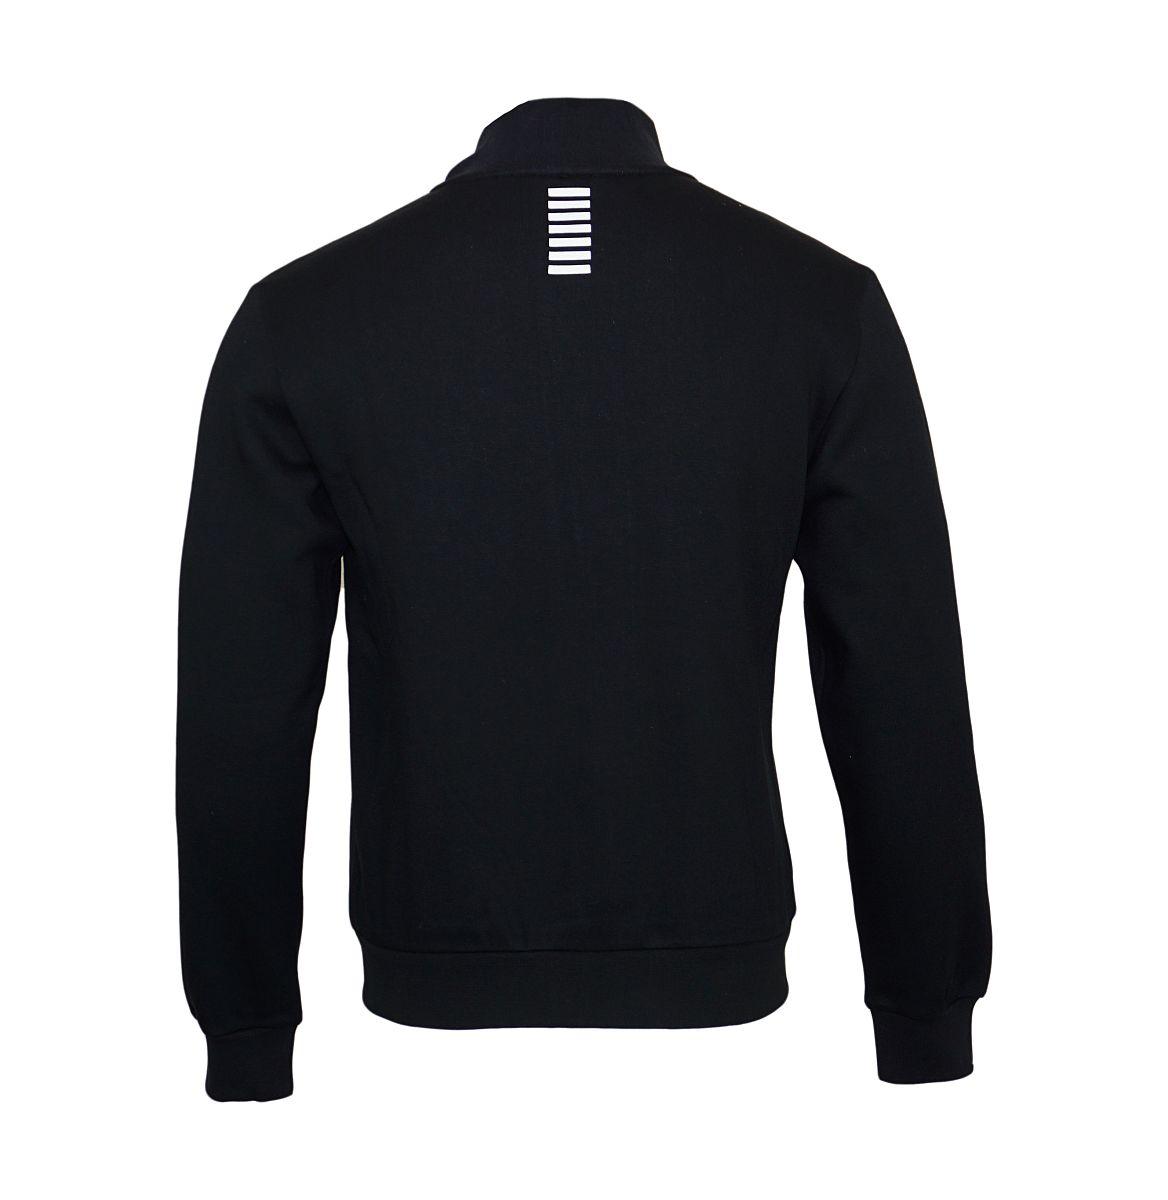 EA7 Emporio Armani Sweatshirt Trainingsjacke 6YPM55 PJ07Z 1200 Black HW17-EATJ1